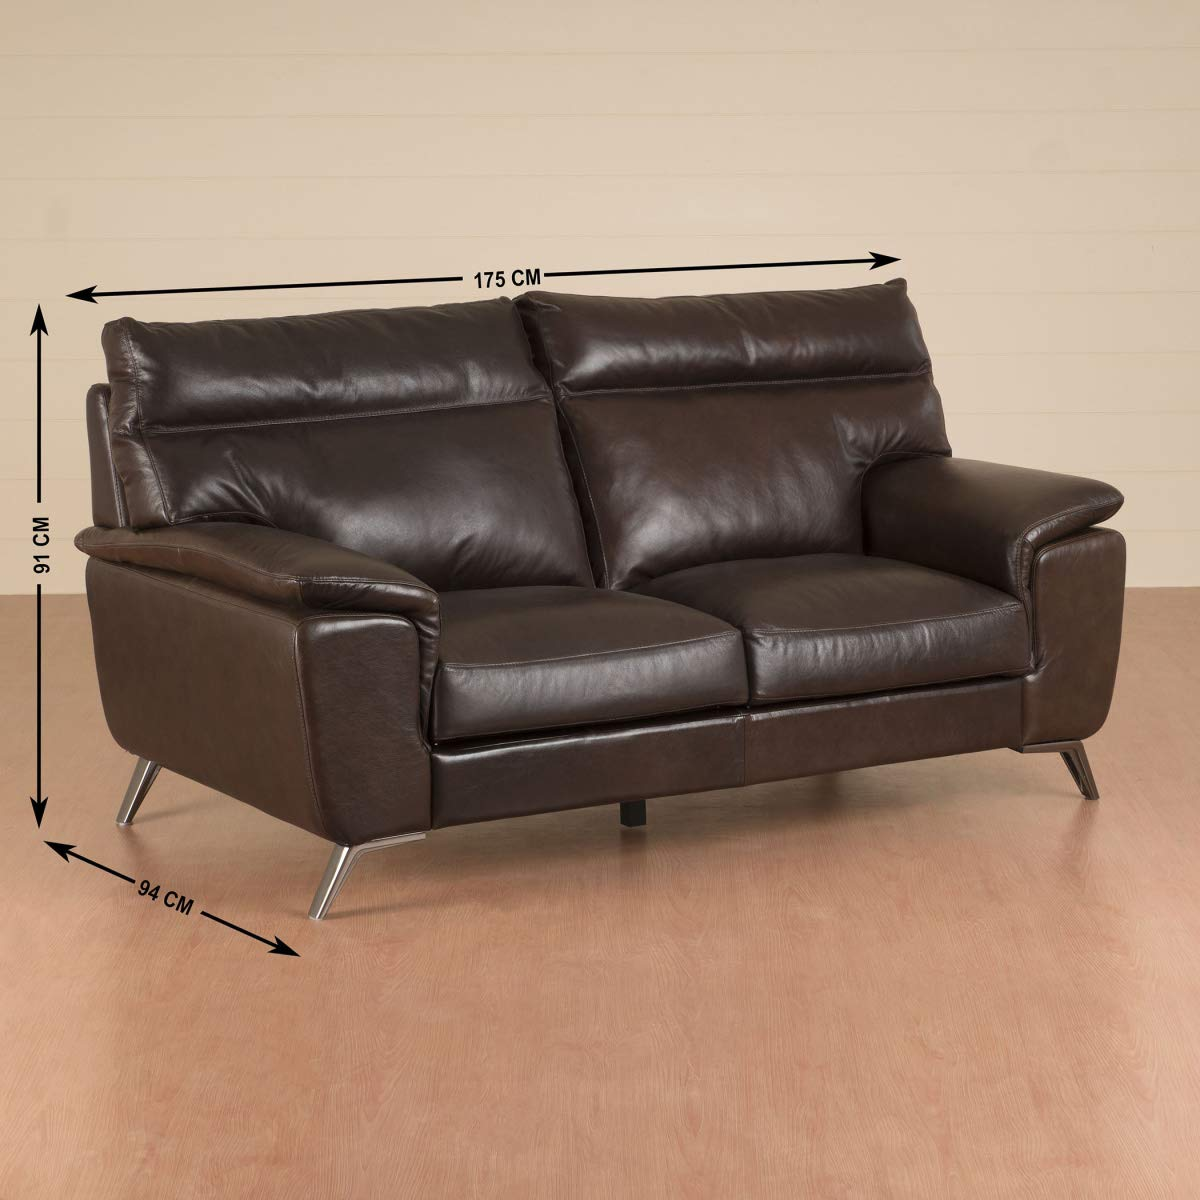 Strange Home Centre Aprilla Two Seater Full Leather Sofa Amazon In Inzonedesignstudio Interior Chair Design Inzonedesignstudiocom